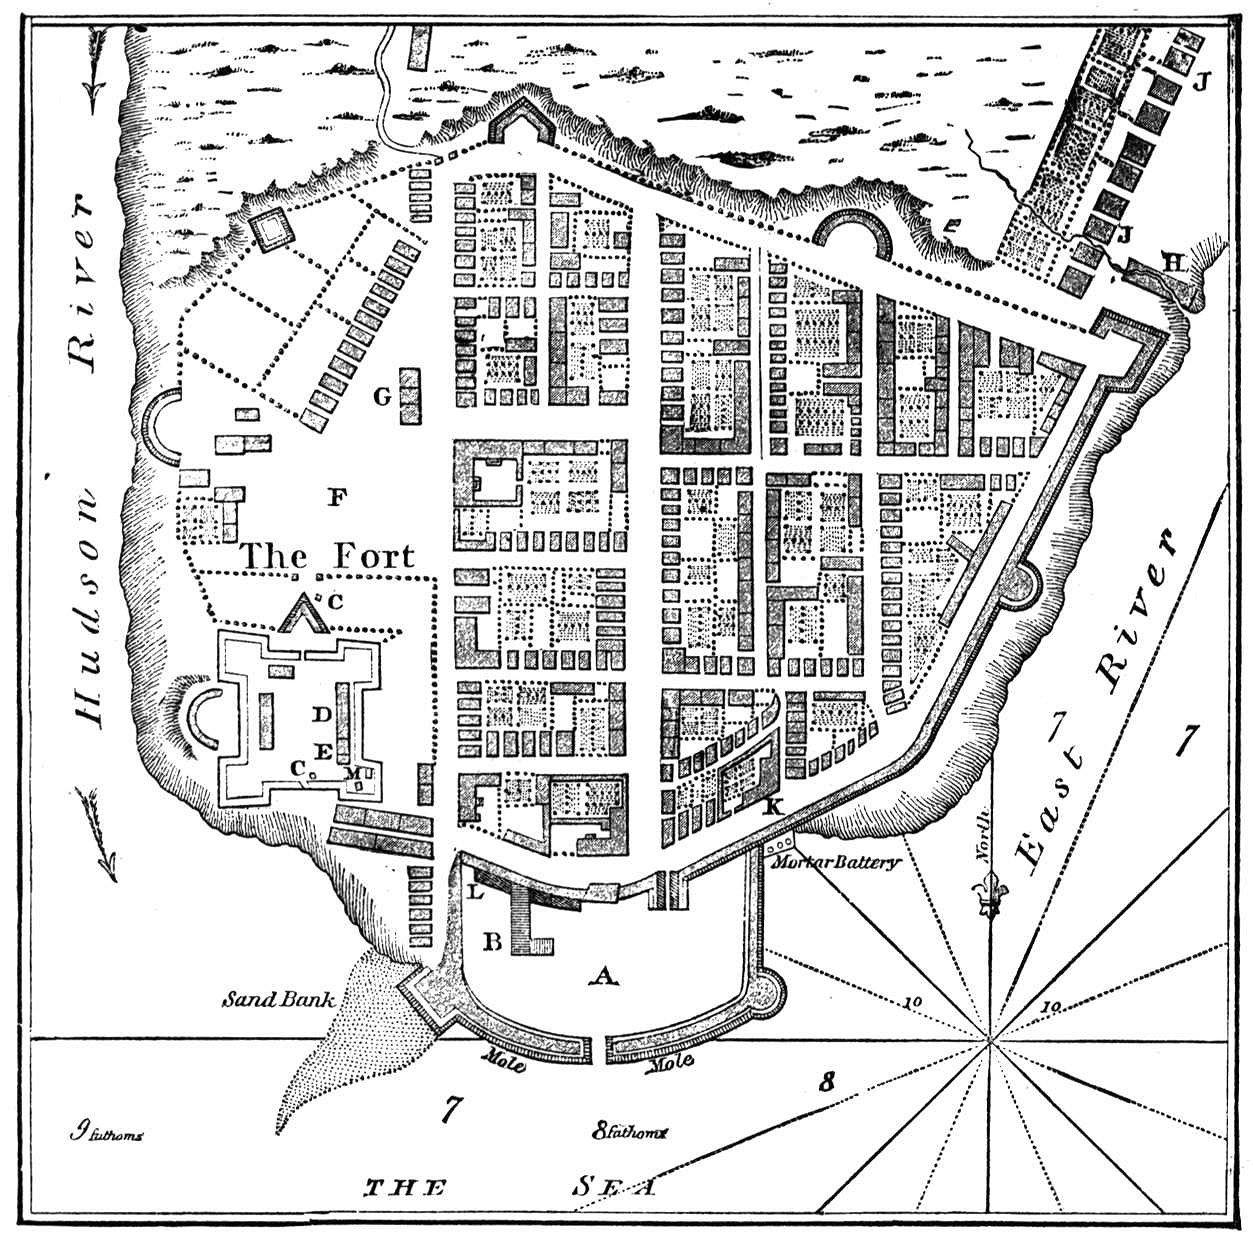 New York County New York Maps And Gazetteers